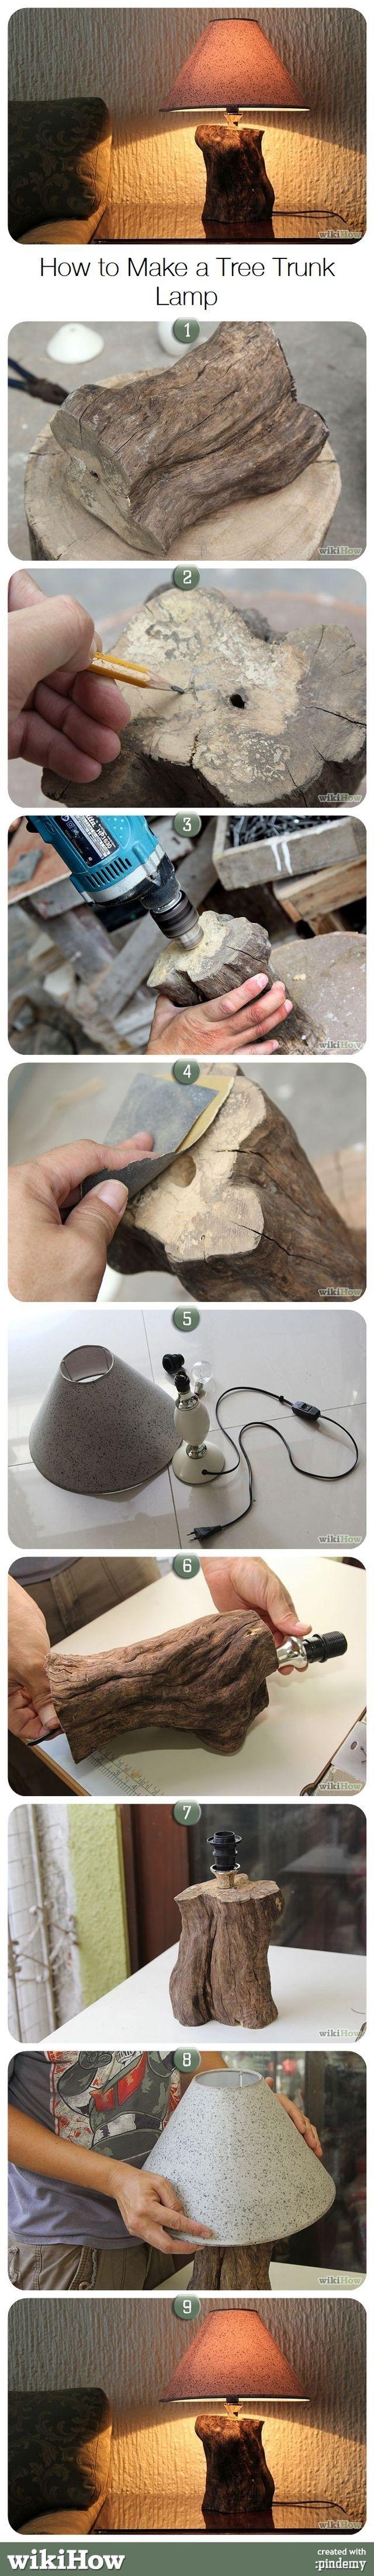 Driftwood lamp 11 diy s guide patterns - Como Hacer Una Lampara De Madera